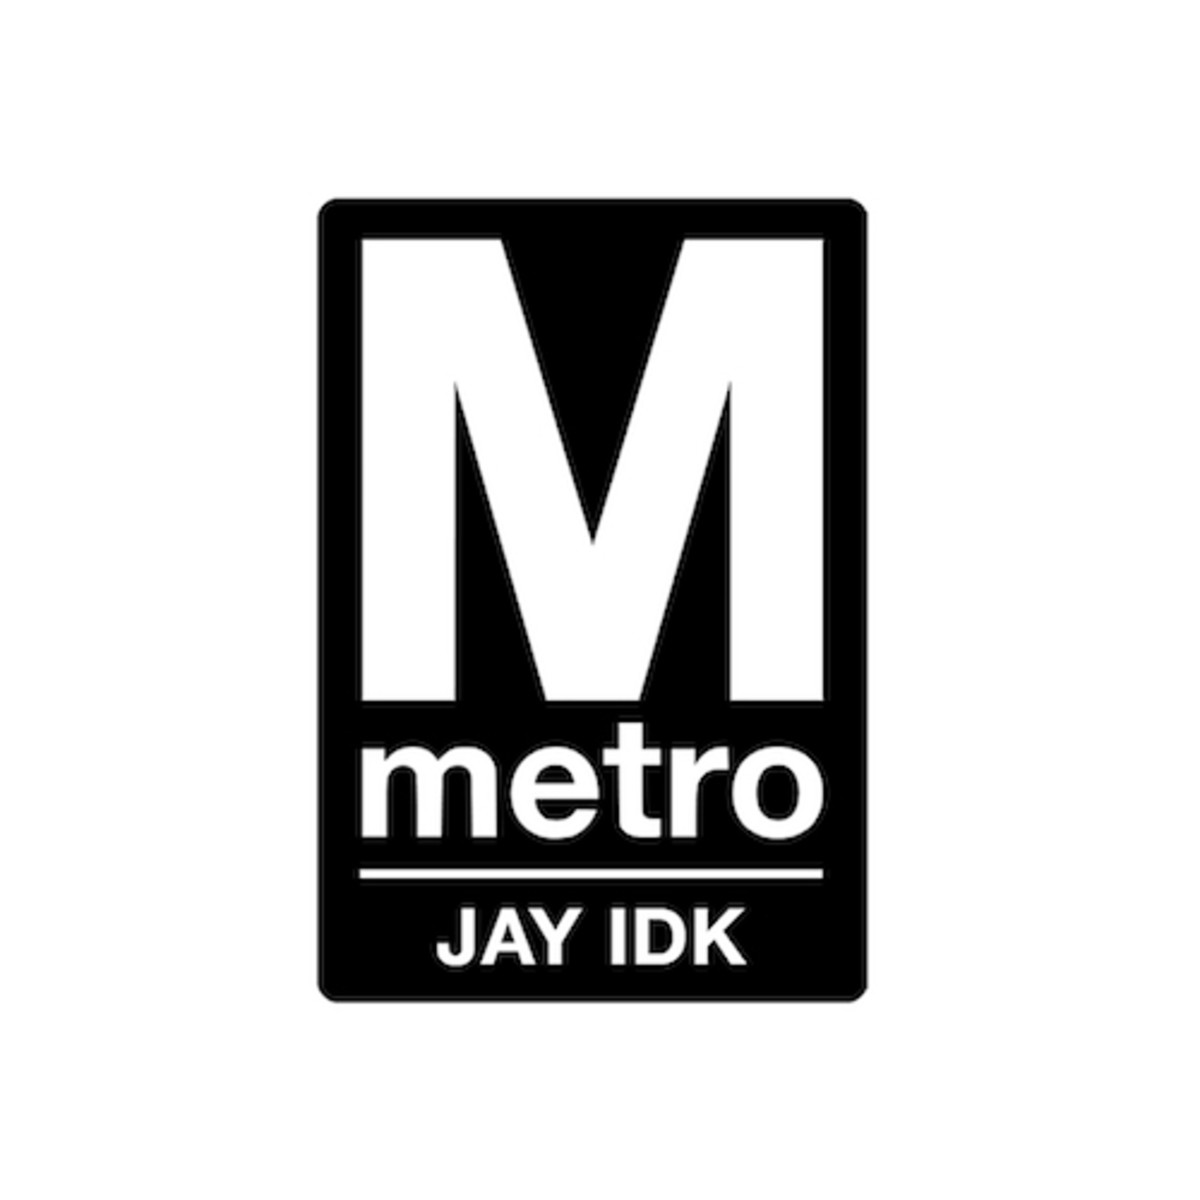 jay-idk-metro.jpg